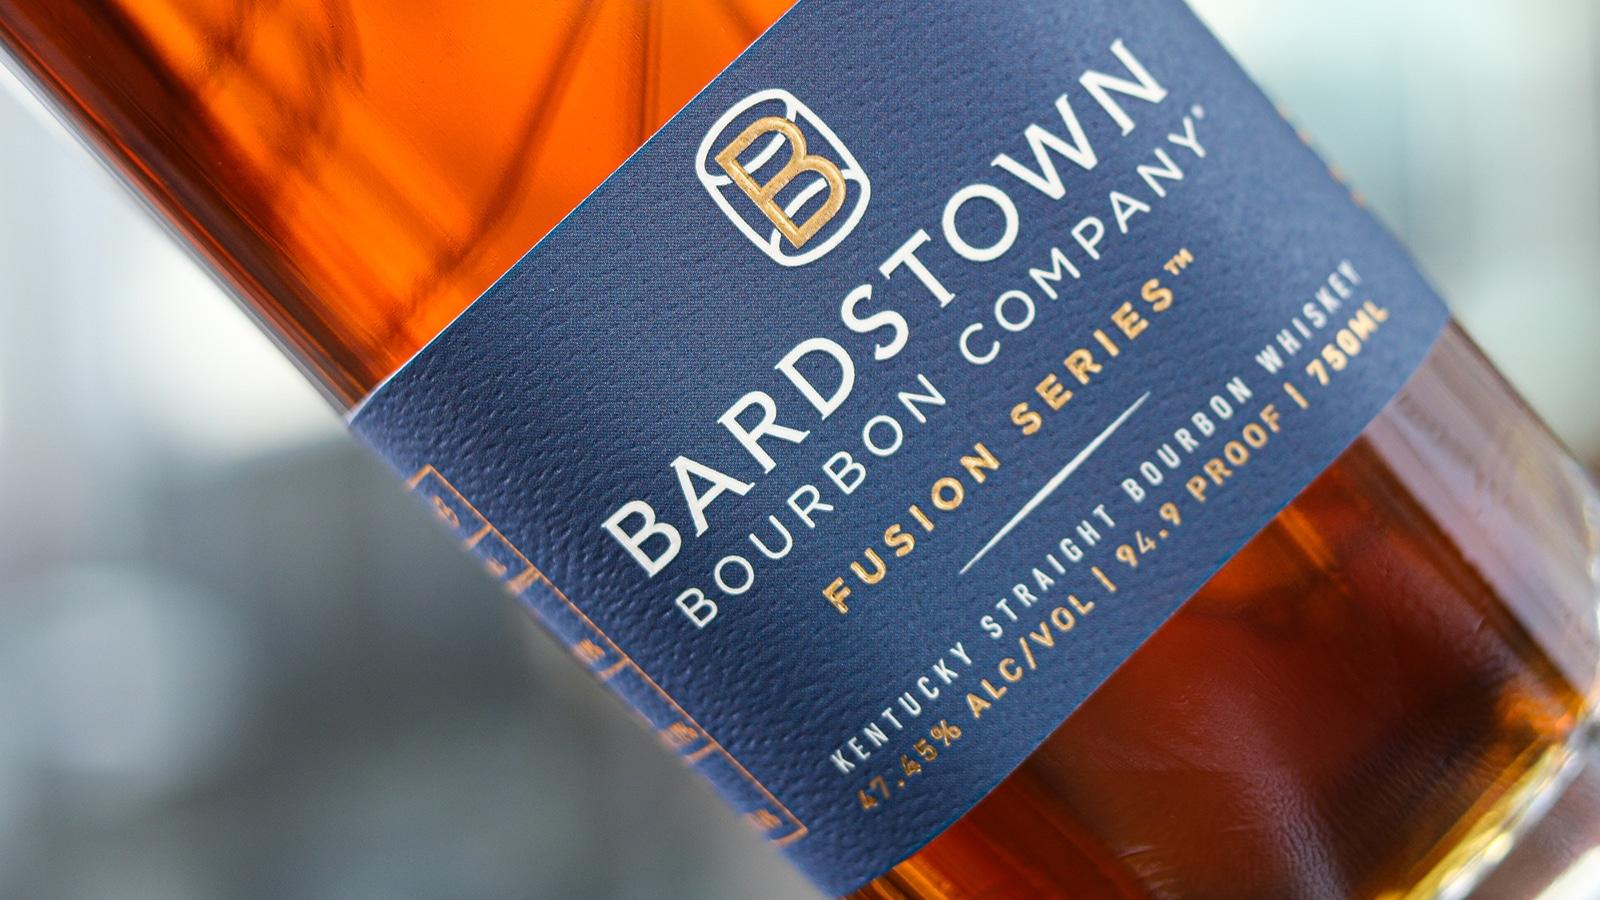 Bardstown Bourbon Fusion 4